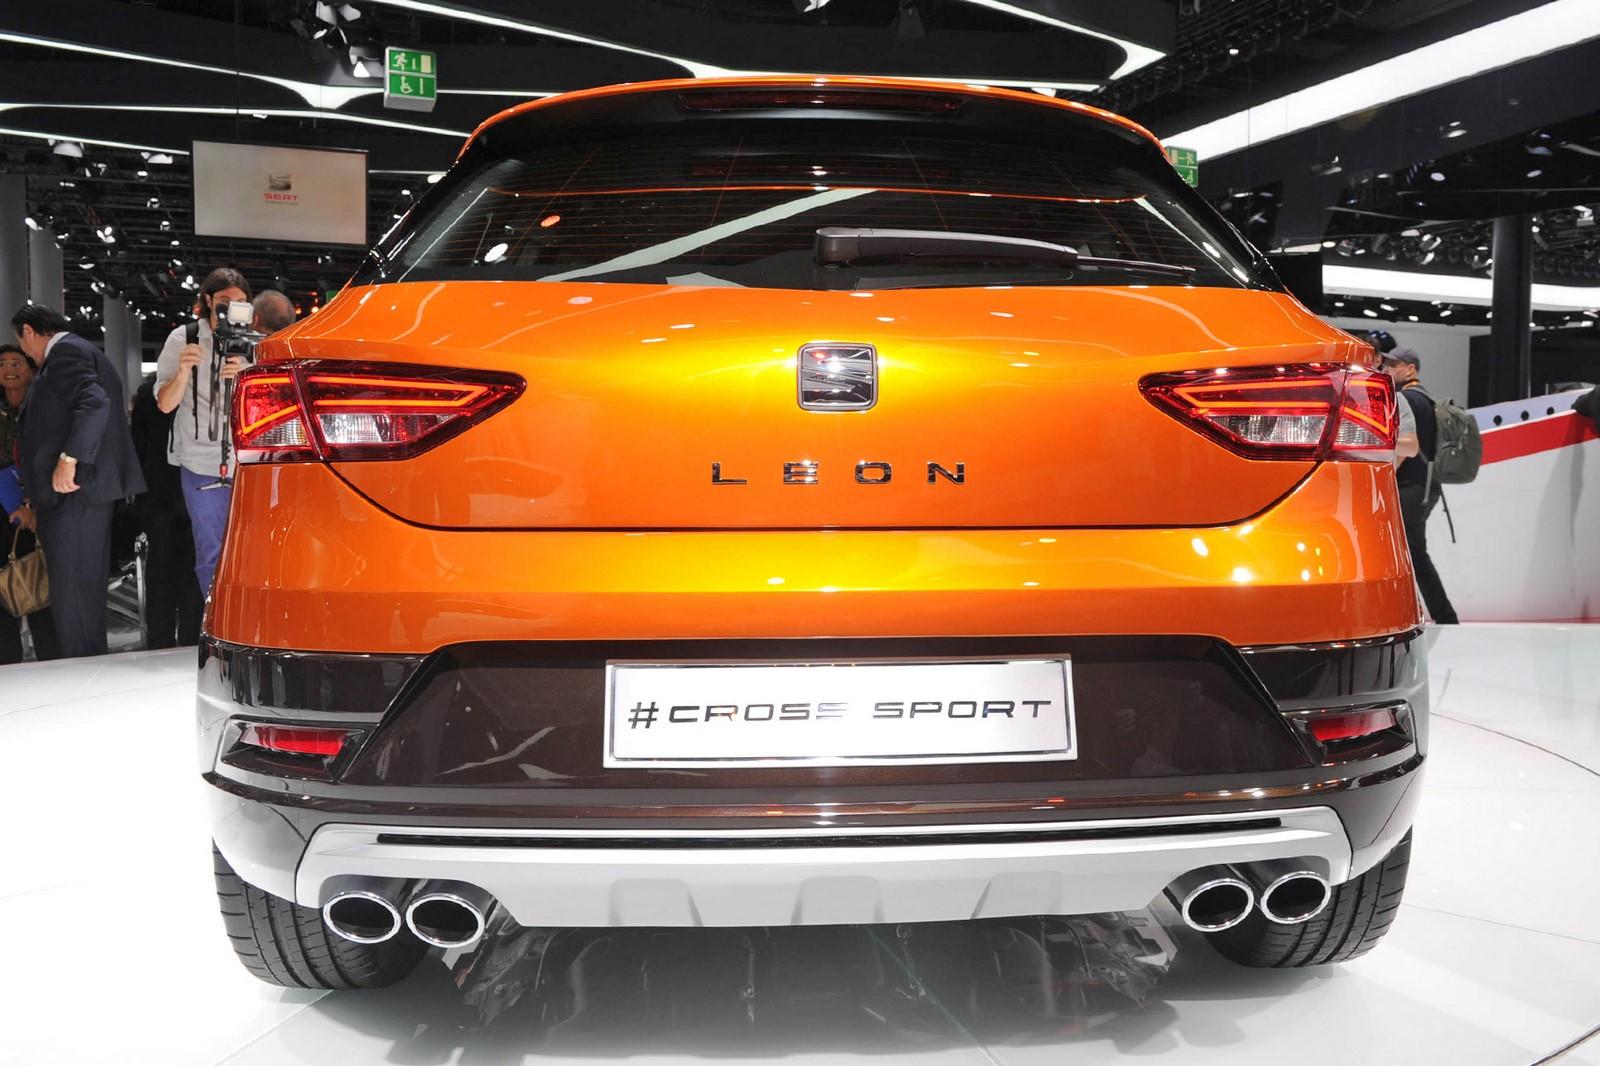 frankfurt 2015 seat leon cross sport concept 2016 live photos garage car. Black Bedroom Furniture Sets. Home Design Ideas